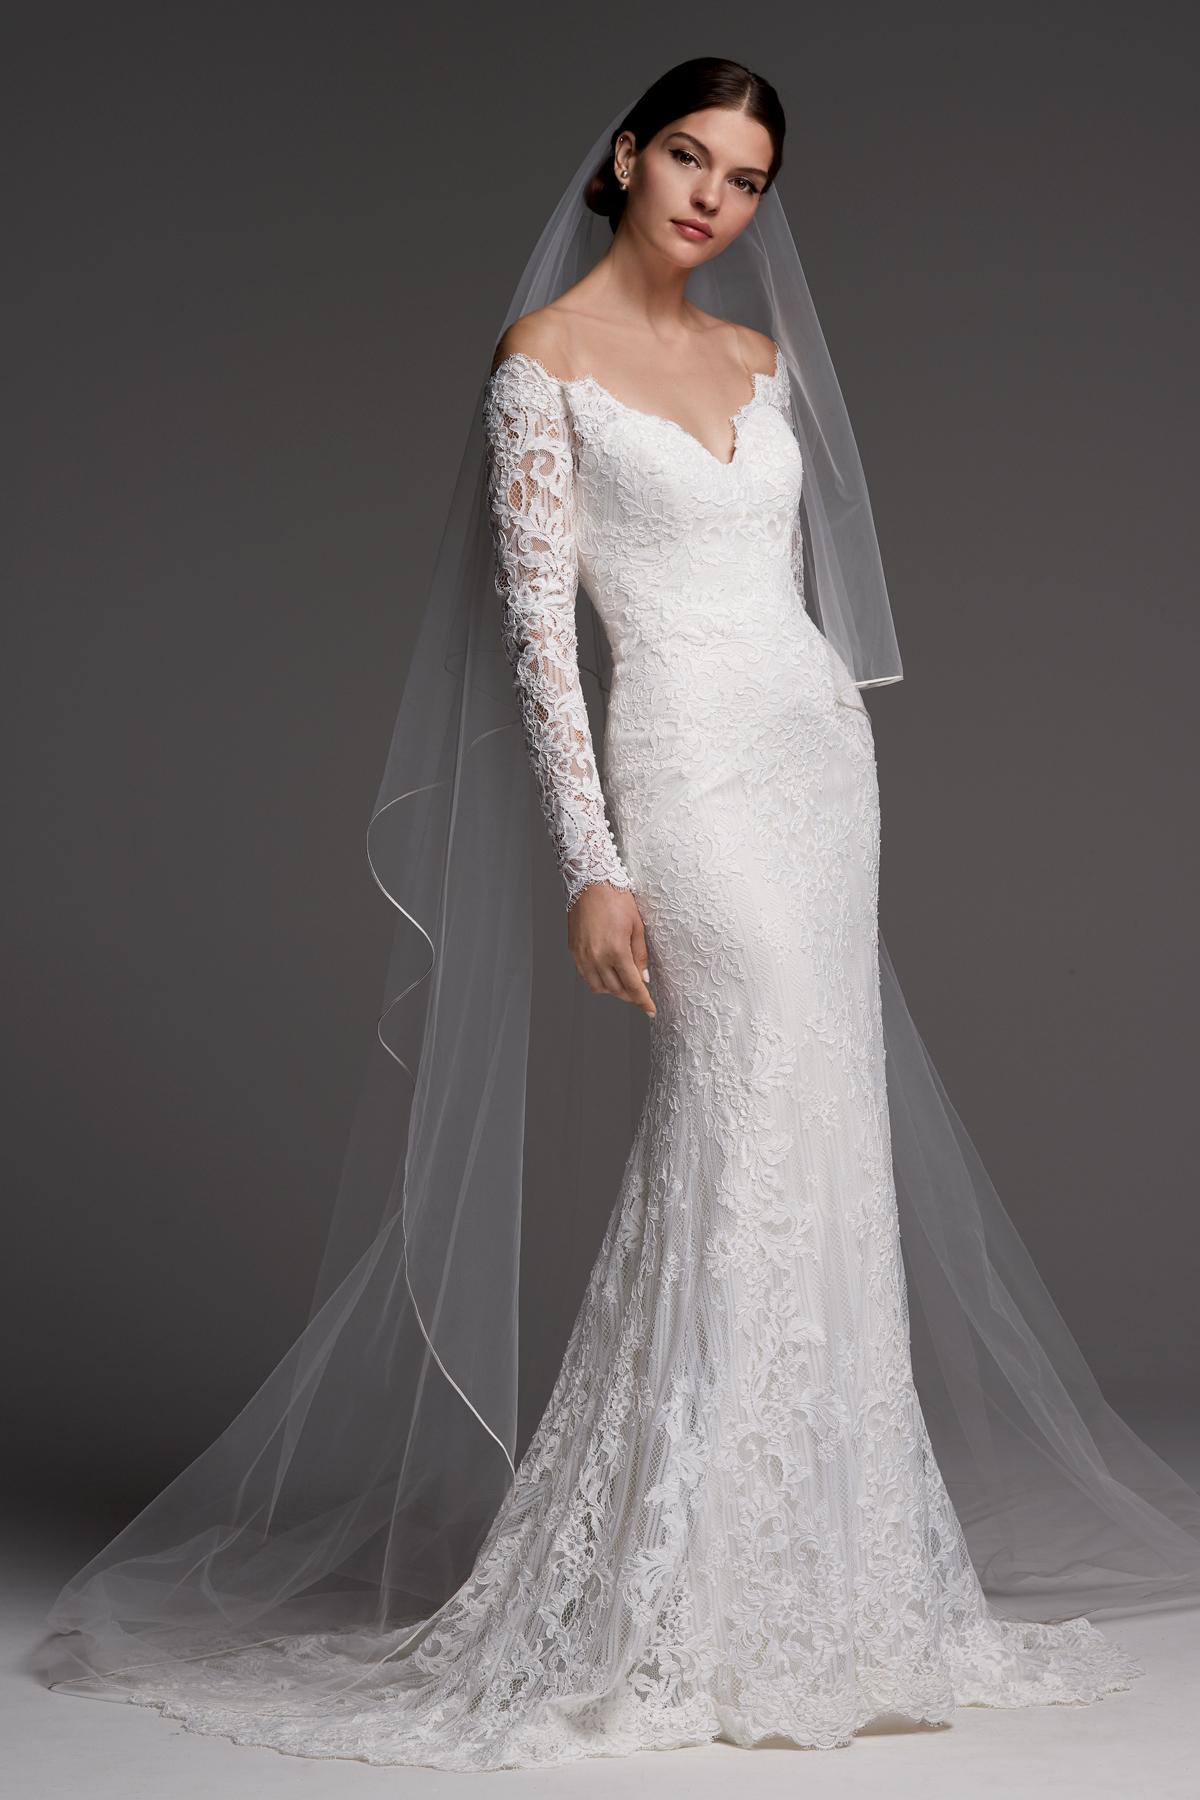 watters wedding dress fall 2018 v-neck long sleeve